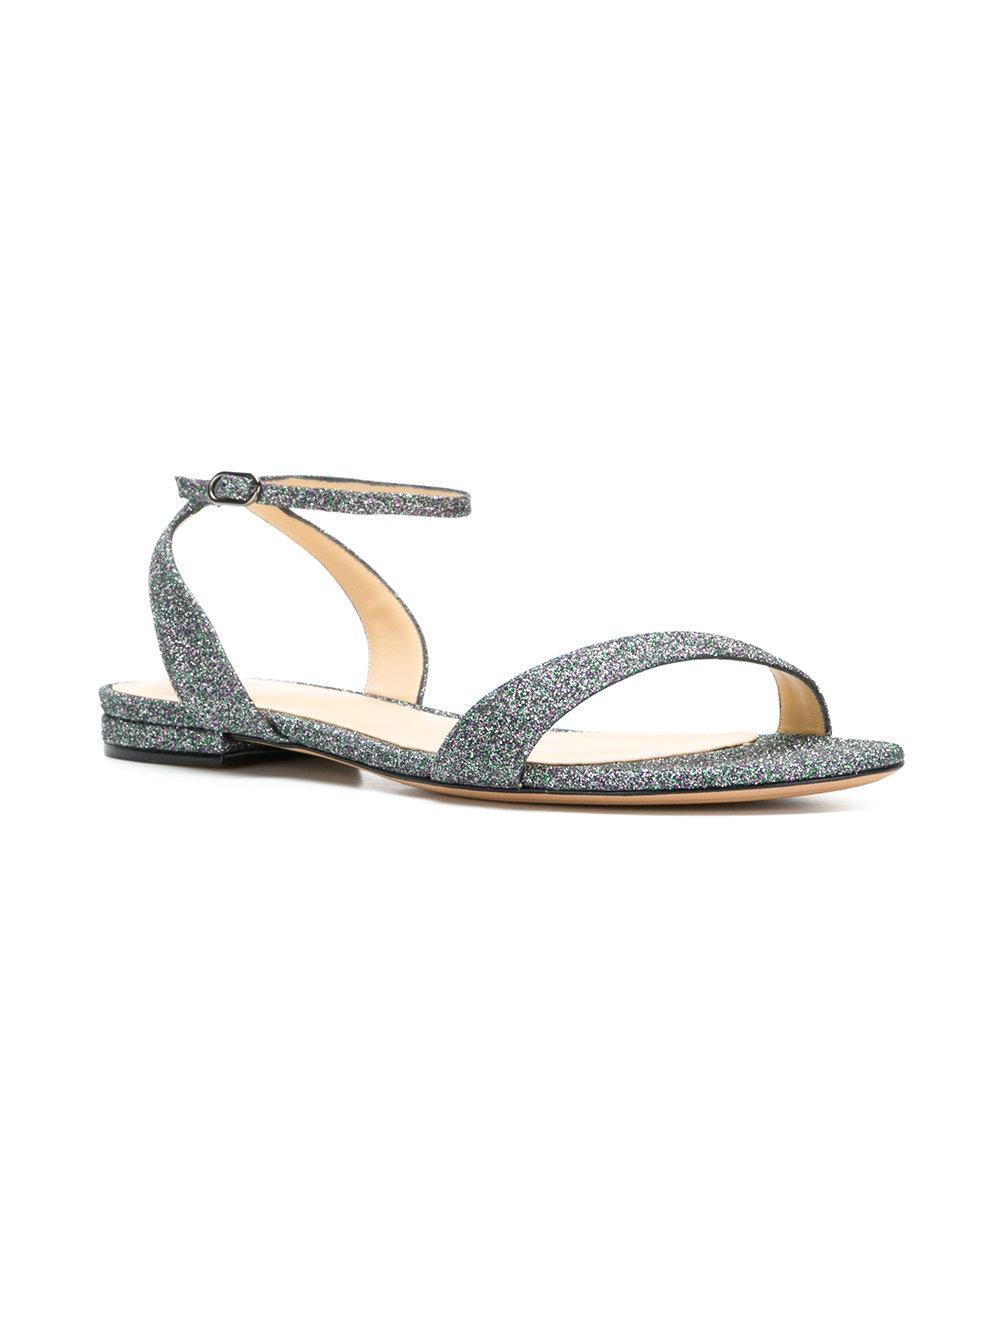 glitter buckled sandals - Metallic Alexandre Birman O5aVDT54